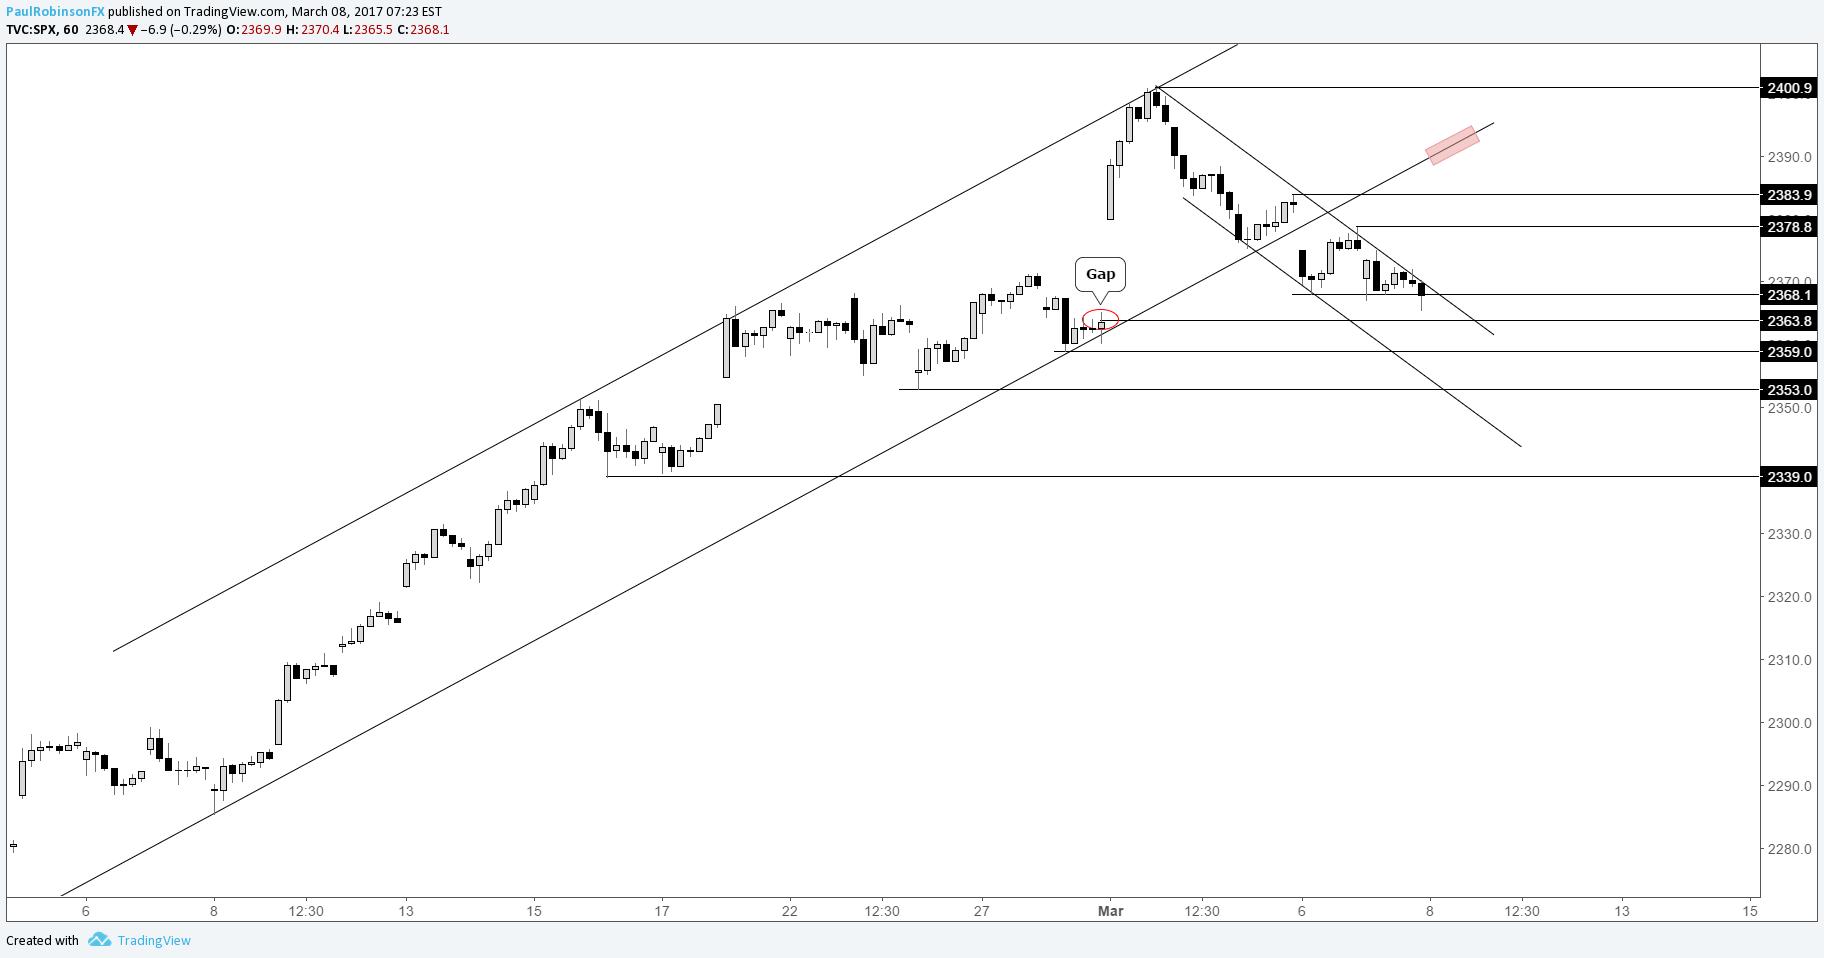 Short term forex trader news